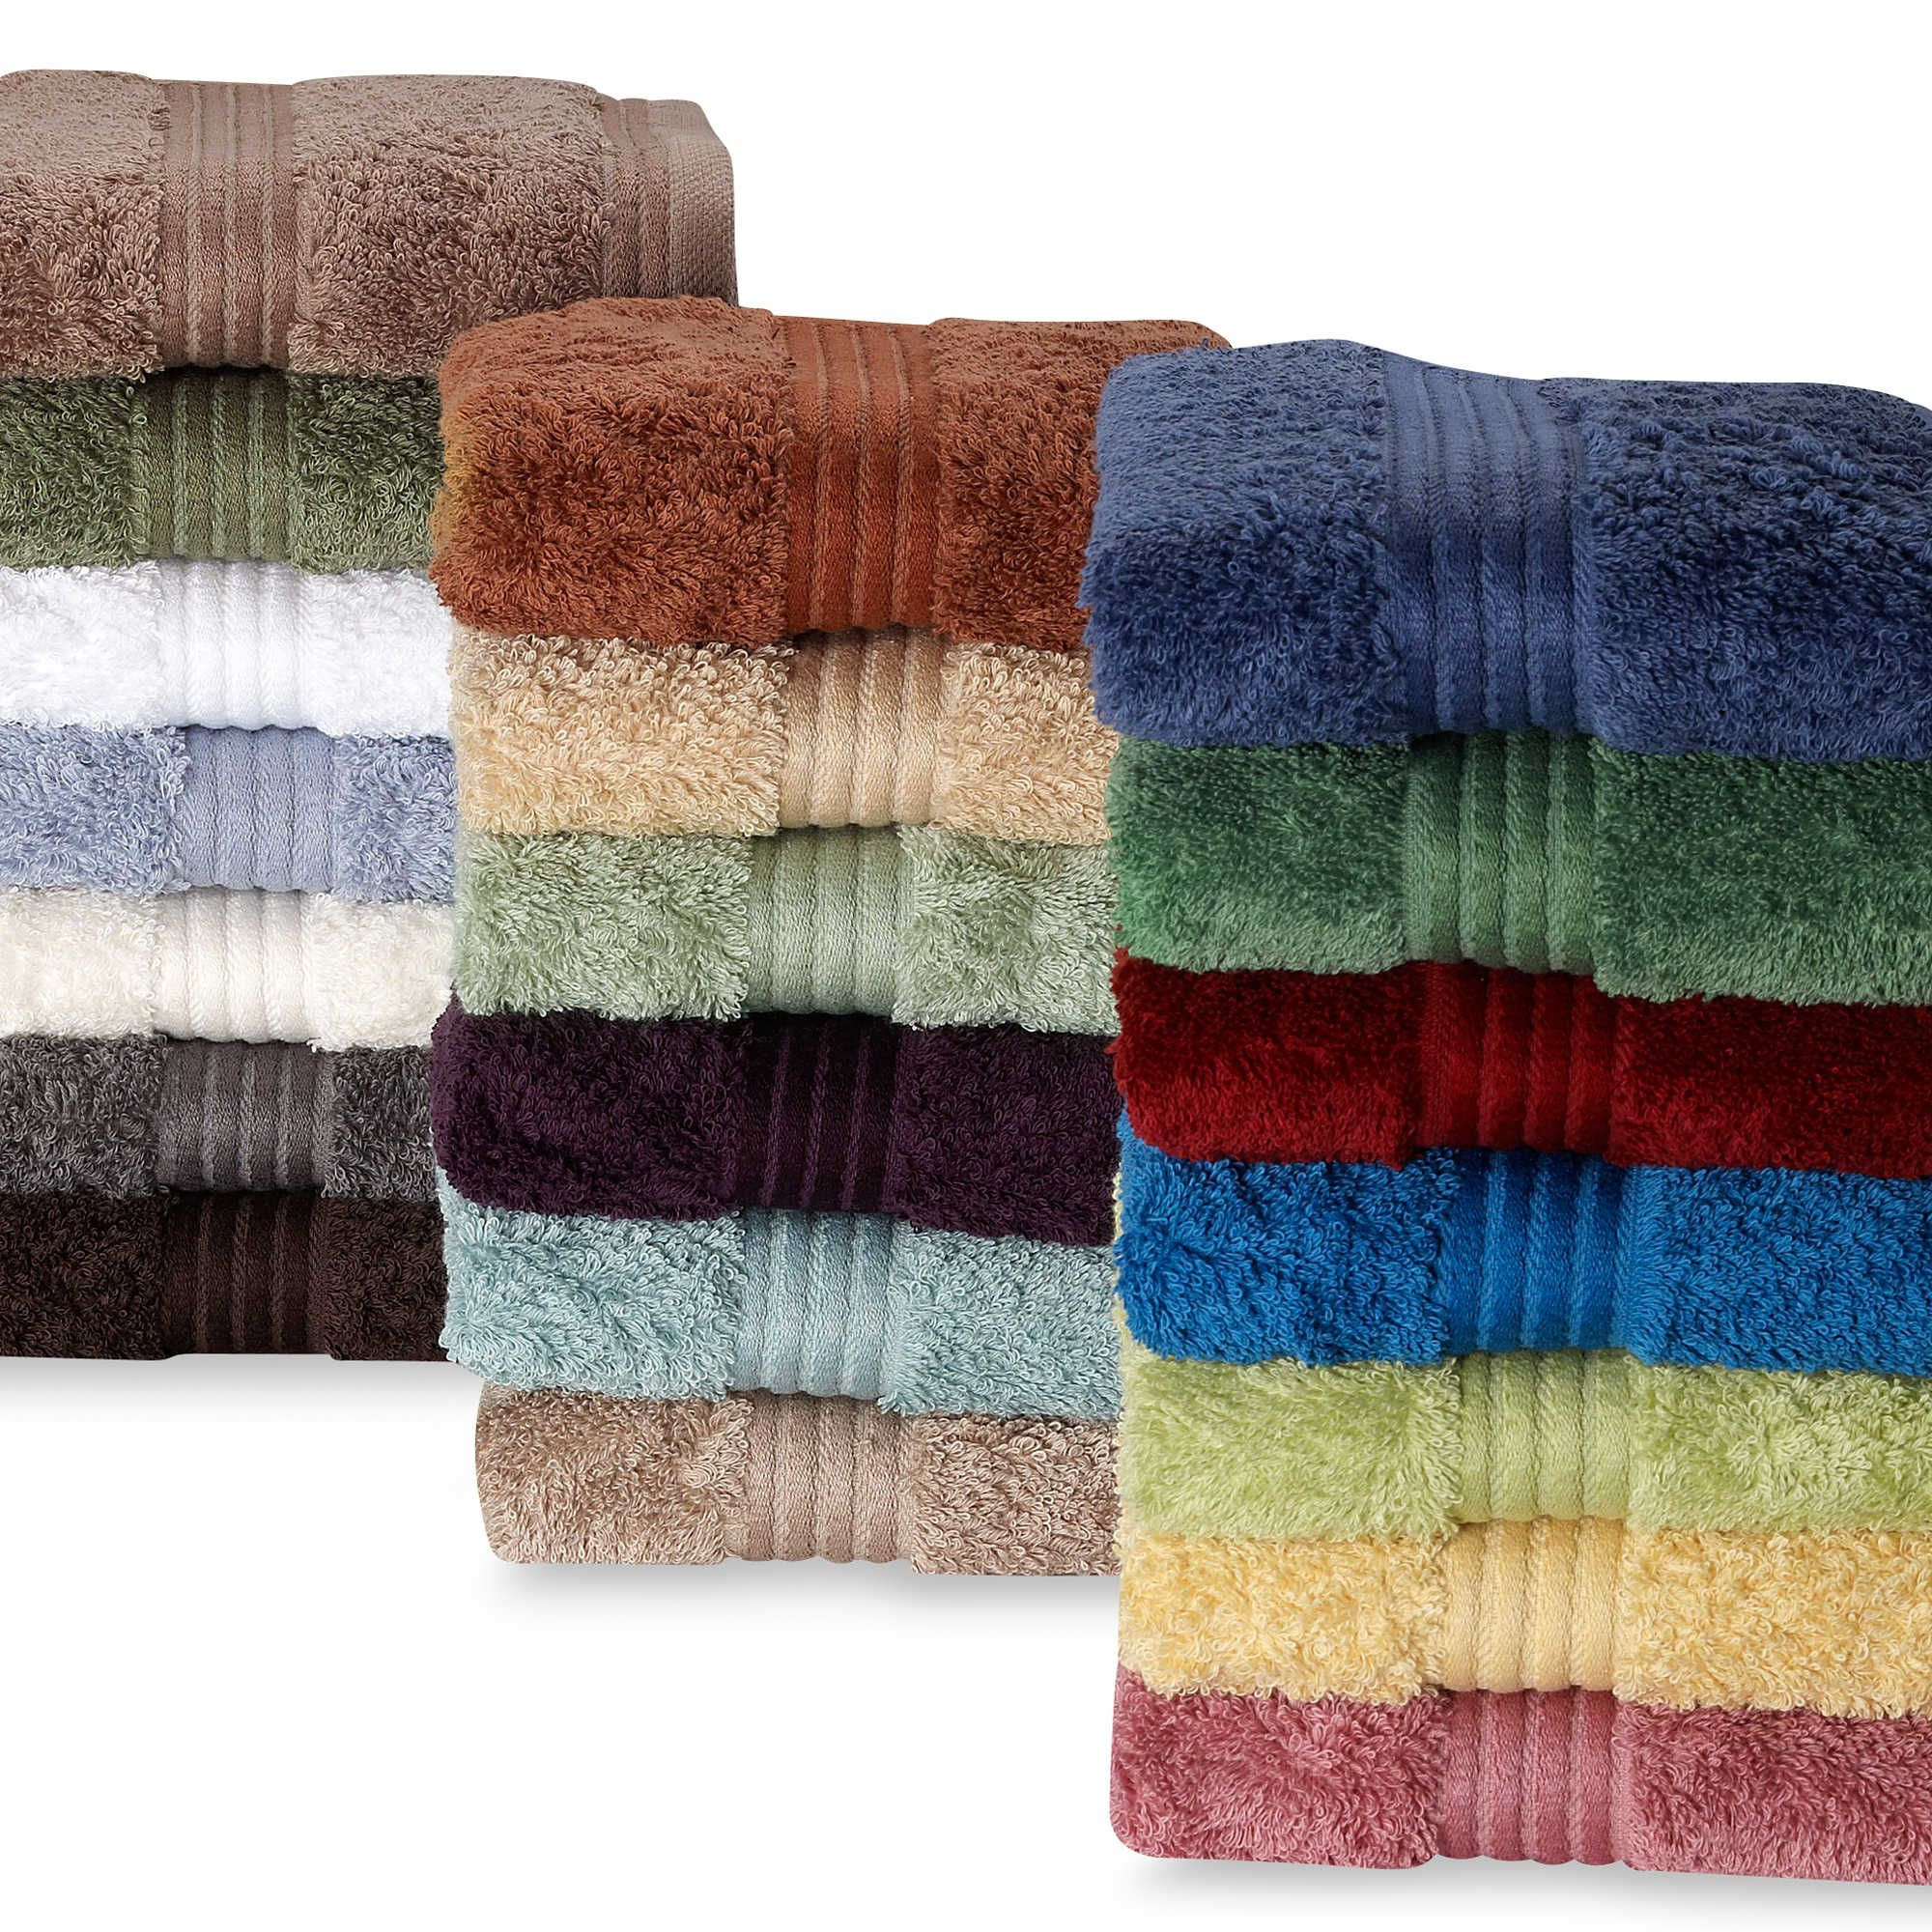 Palais Royale Hotel Towels Hotel Towels Hotel Bath Towels